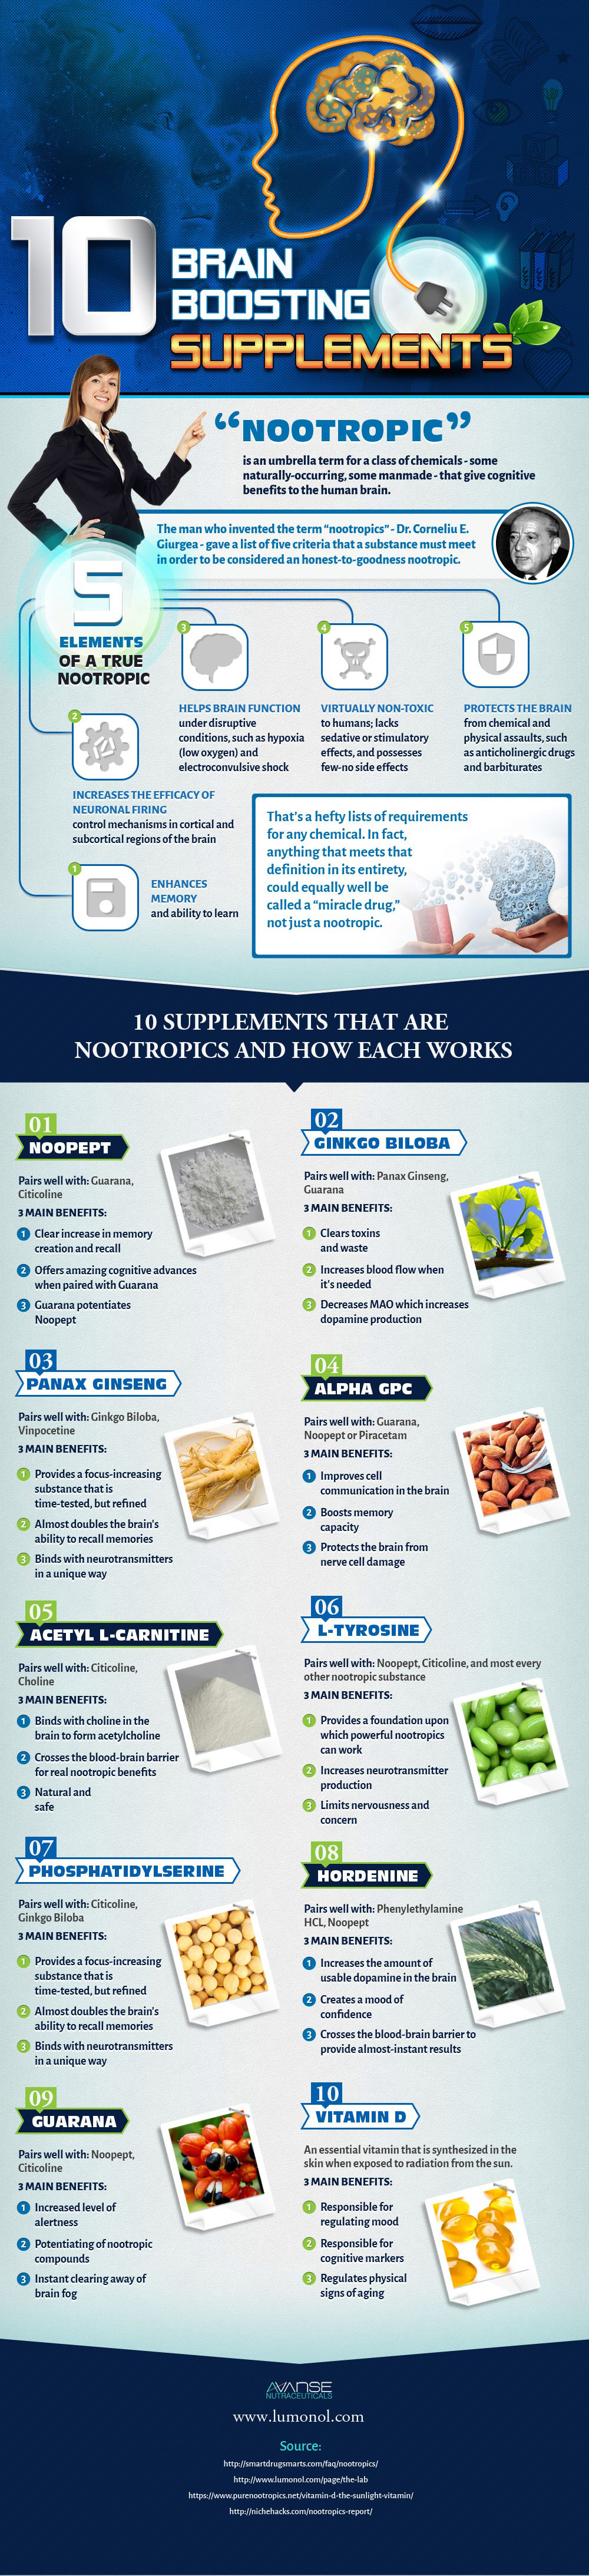 10 Brain Boosting Supplements